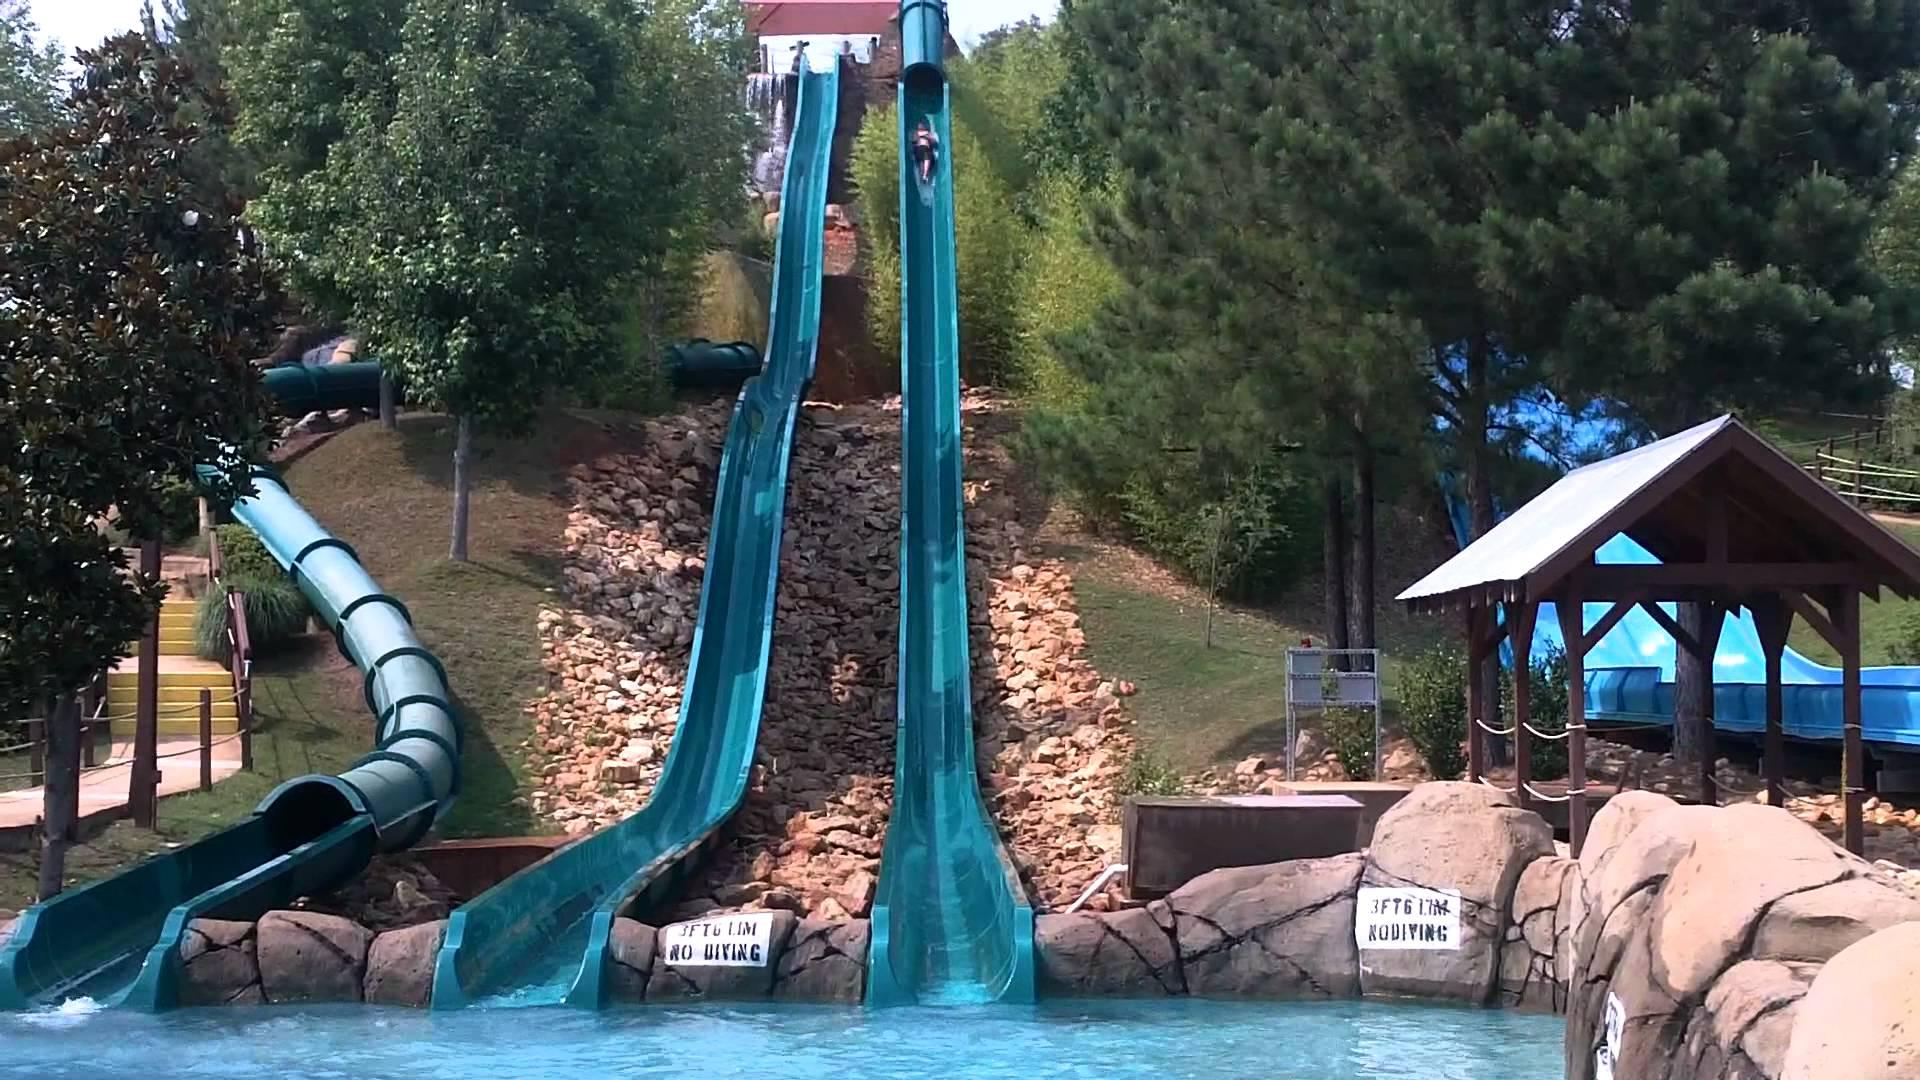 Geyser Falls Water Theme Park 209 Black Jack Rd Choctaw, MS ...